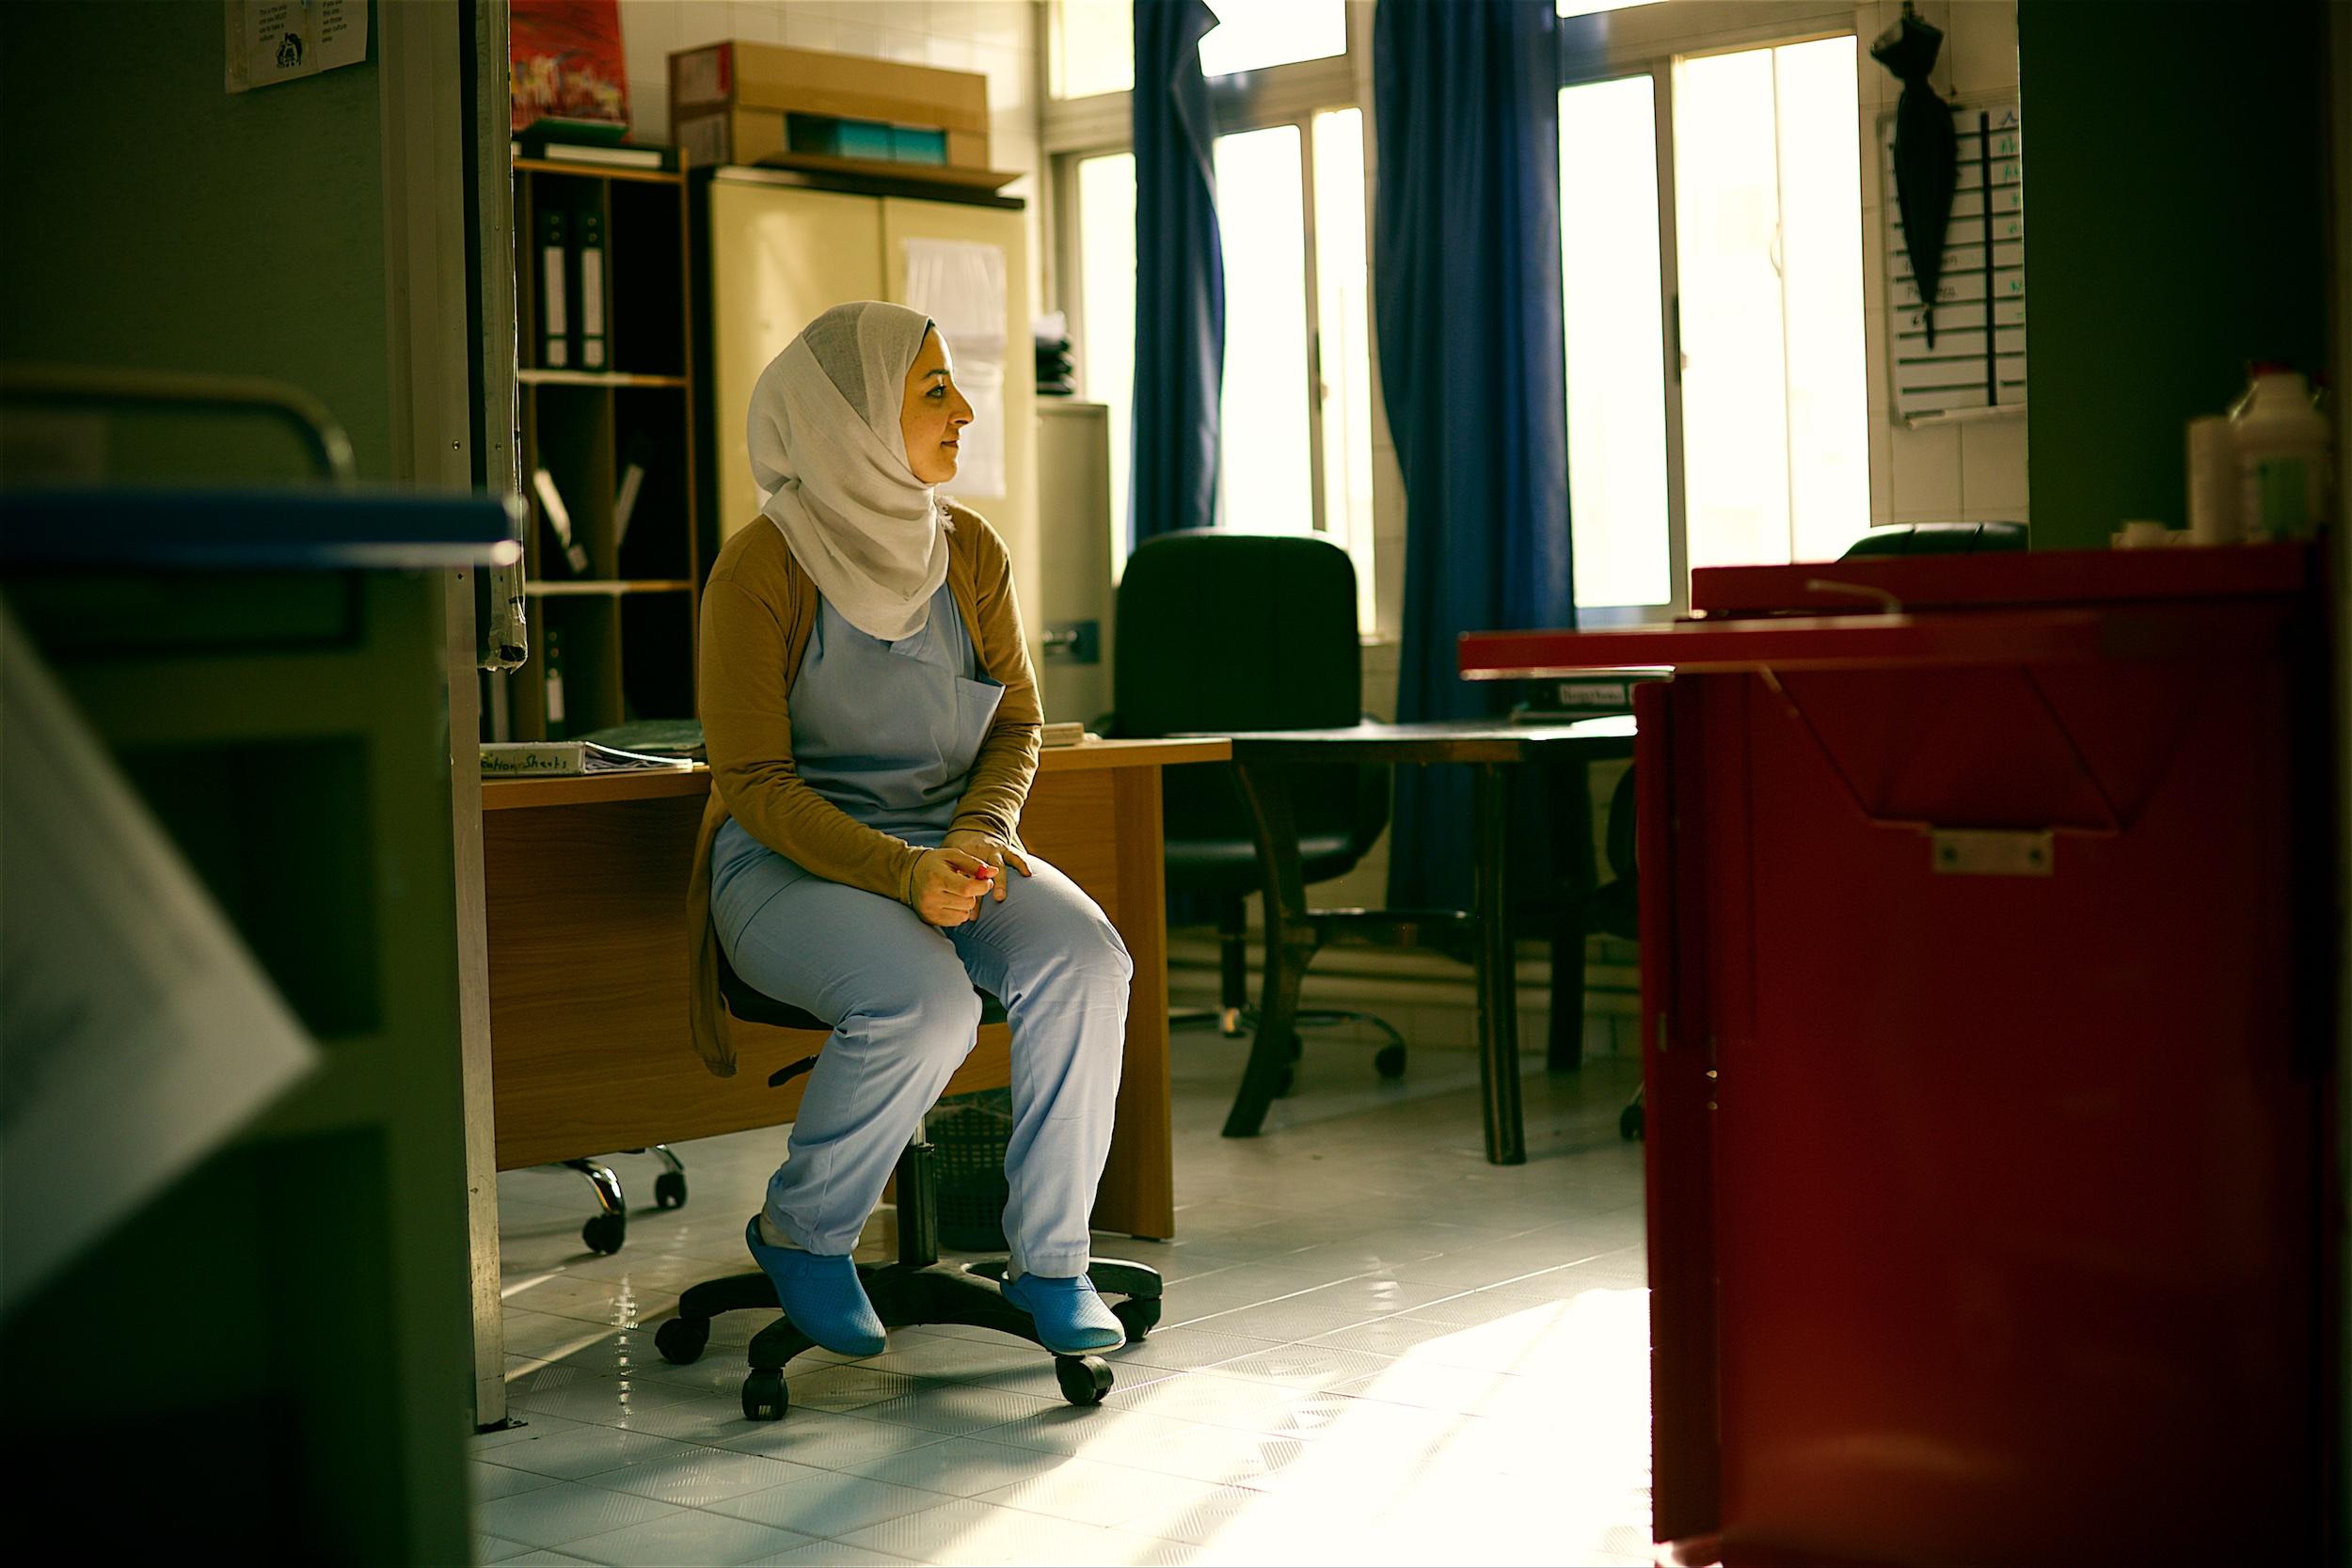 jordan-msf-al-ramtha-dectors-without-borders-war-hospital-refugee-camp-denis-bosnic-17.jpg